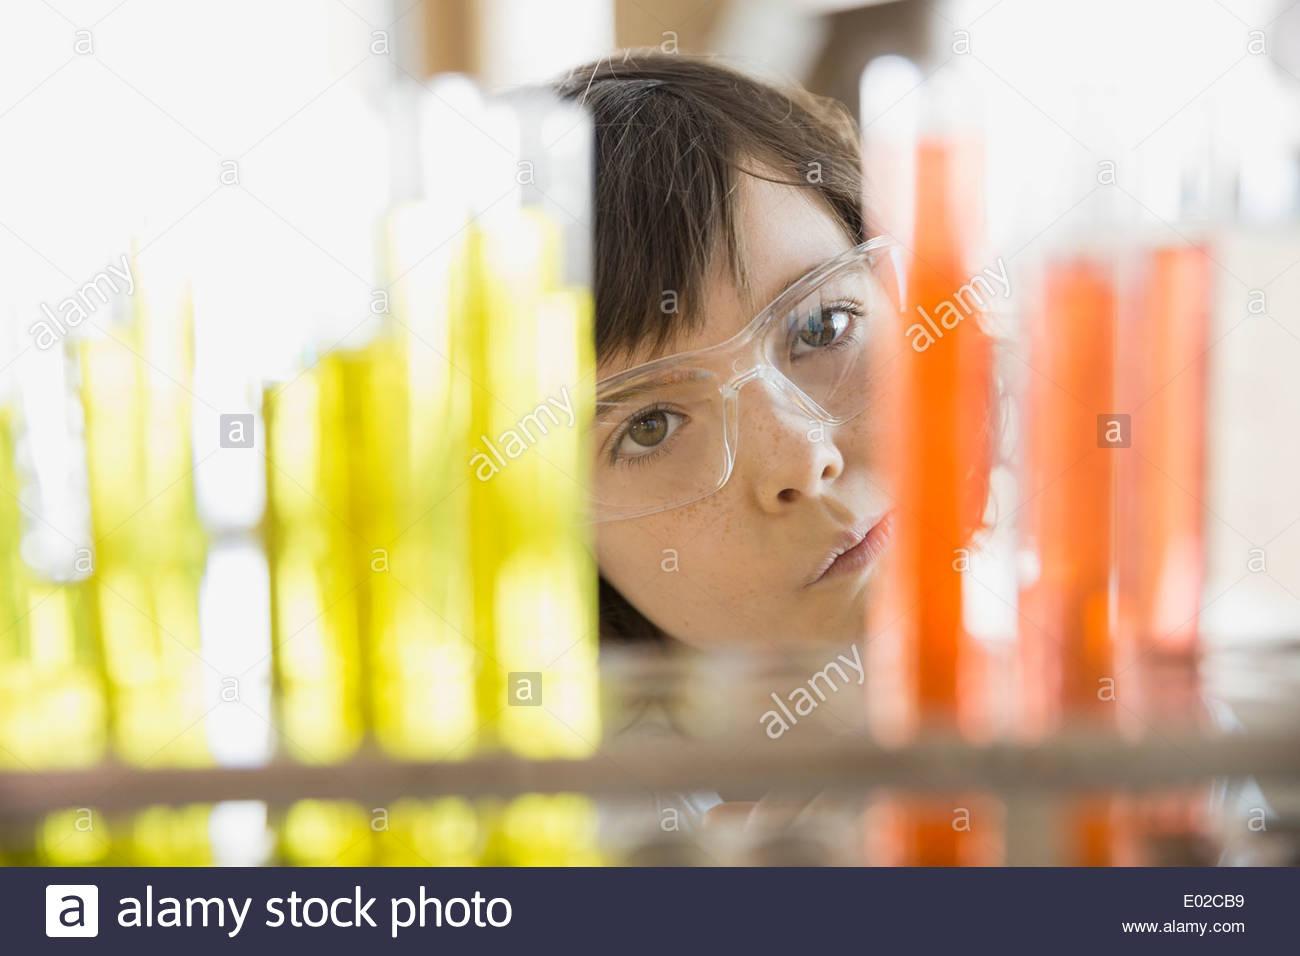 School girl looking at vials in science classroom - Stock Image